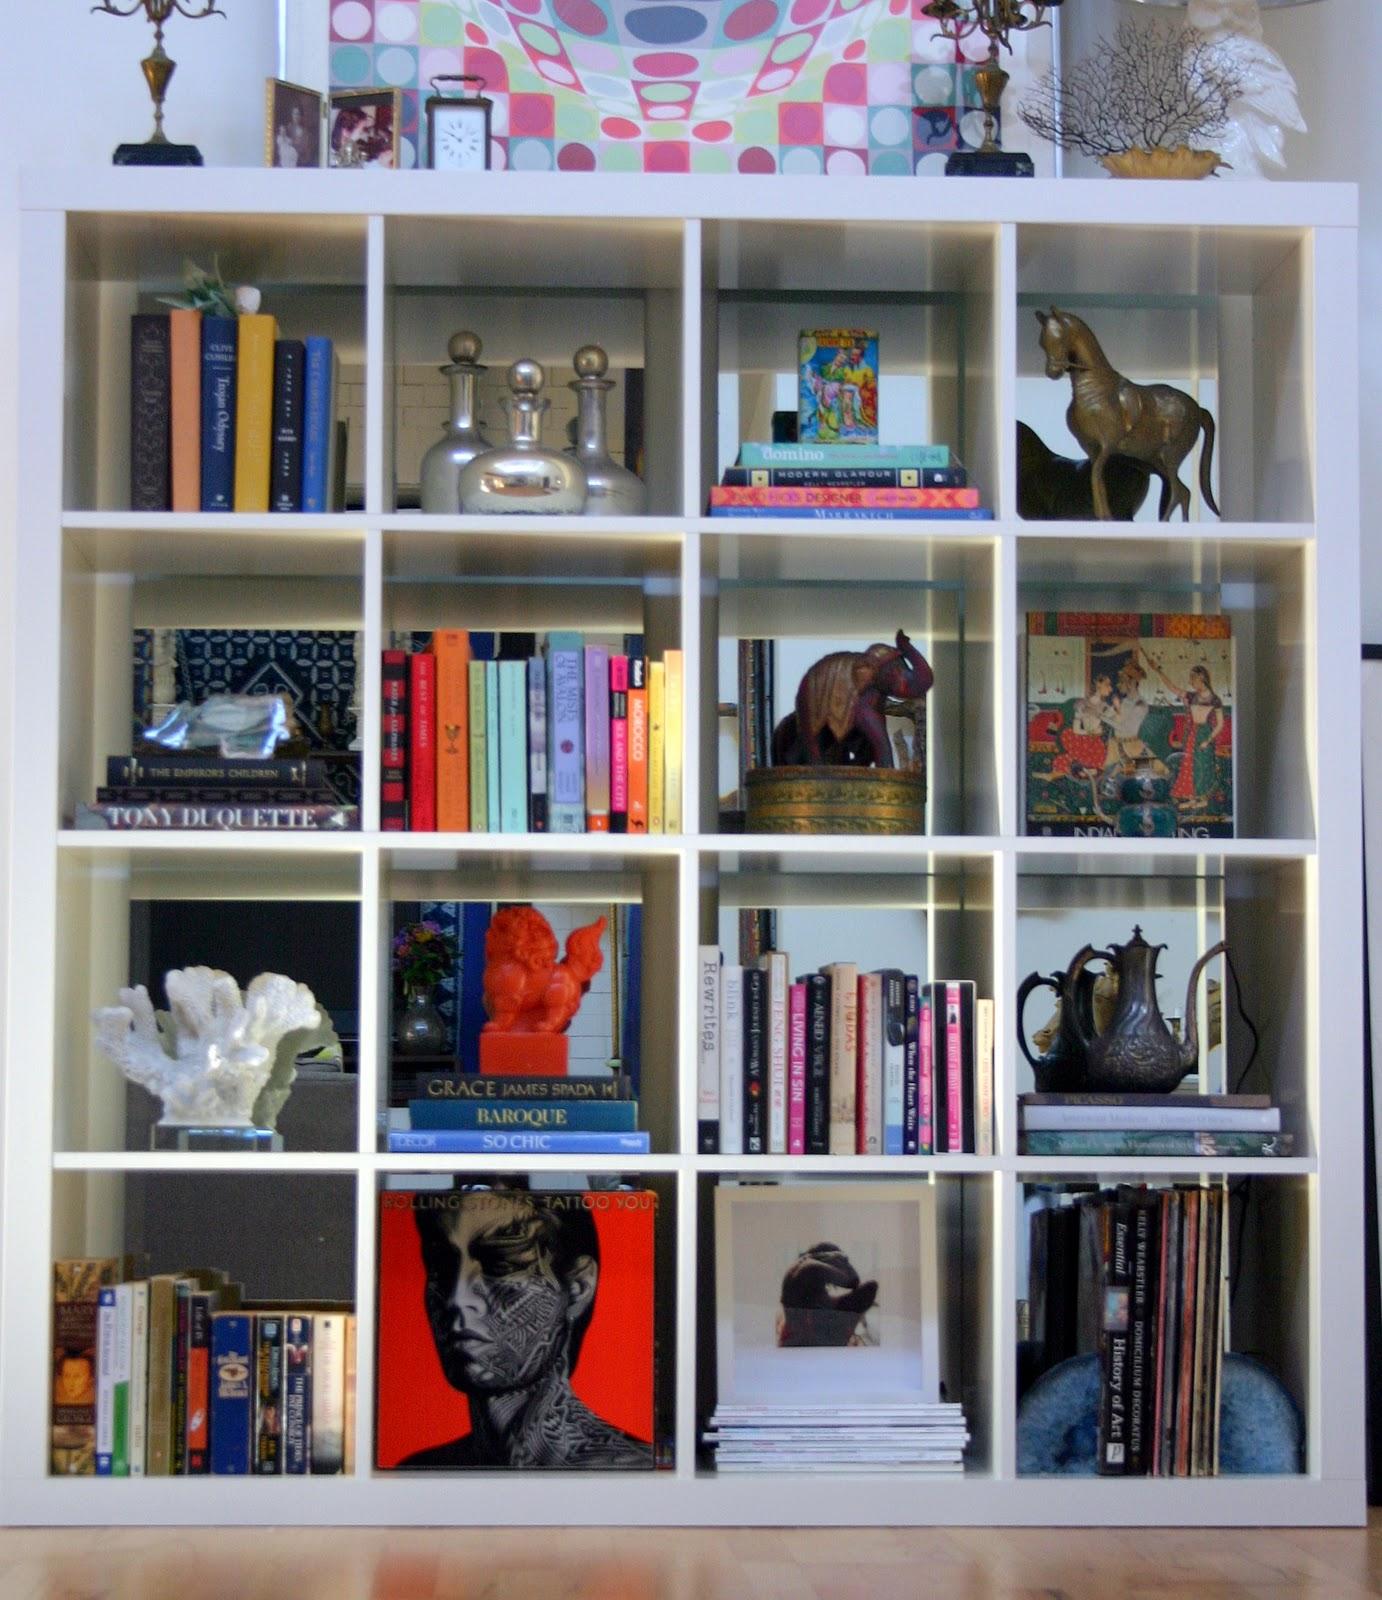 Bookshelf Decor | The Flat Decoration